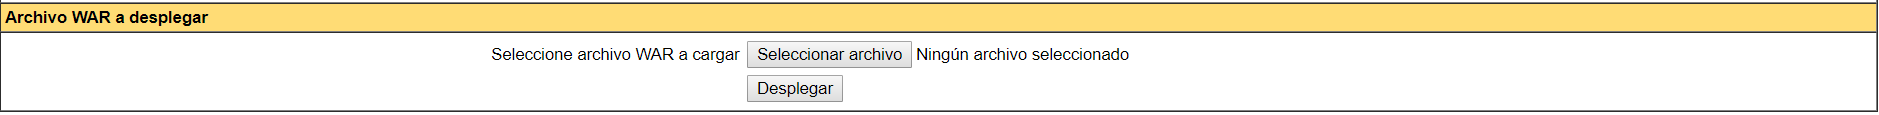 documentacion/ExpliClas/images/Desplegar.PNG